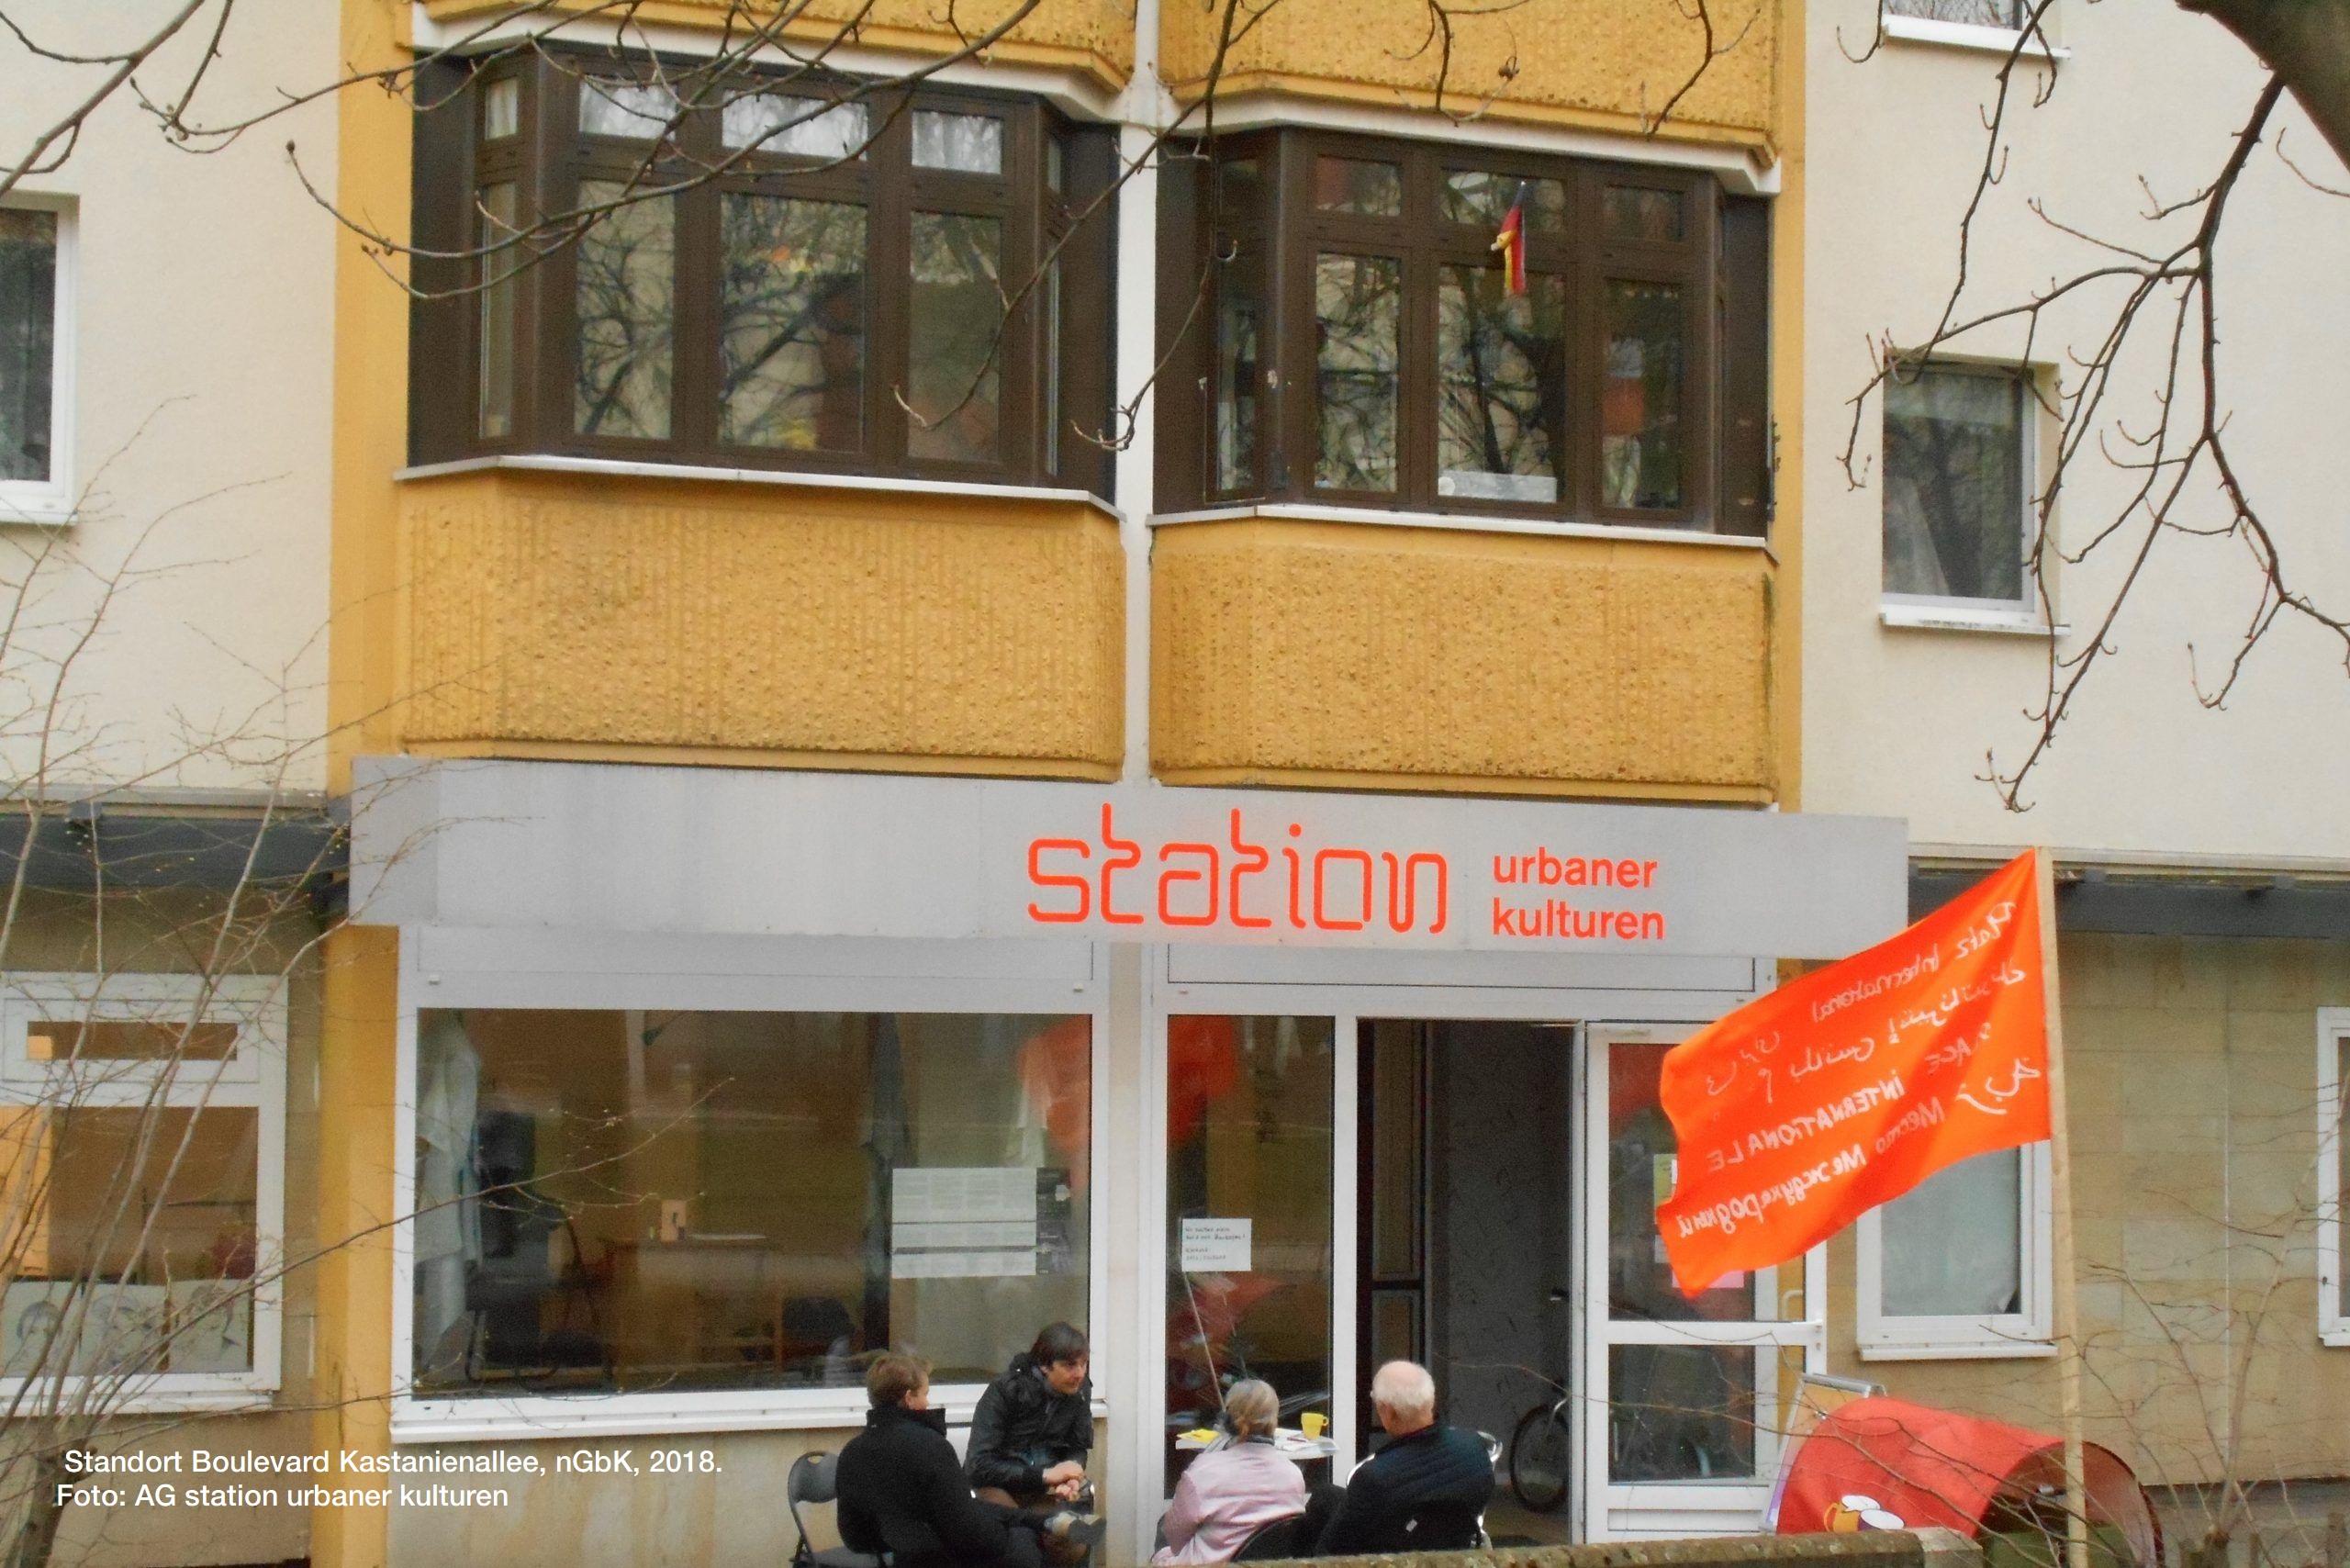 Standort Boulevard Kastanienallee, nGbK, 2018. Foto: AG station urbaner kulturen